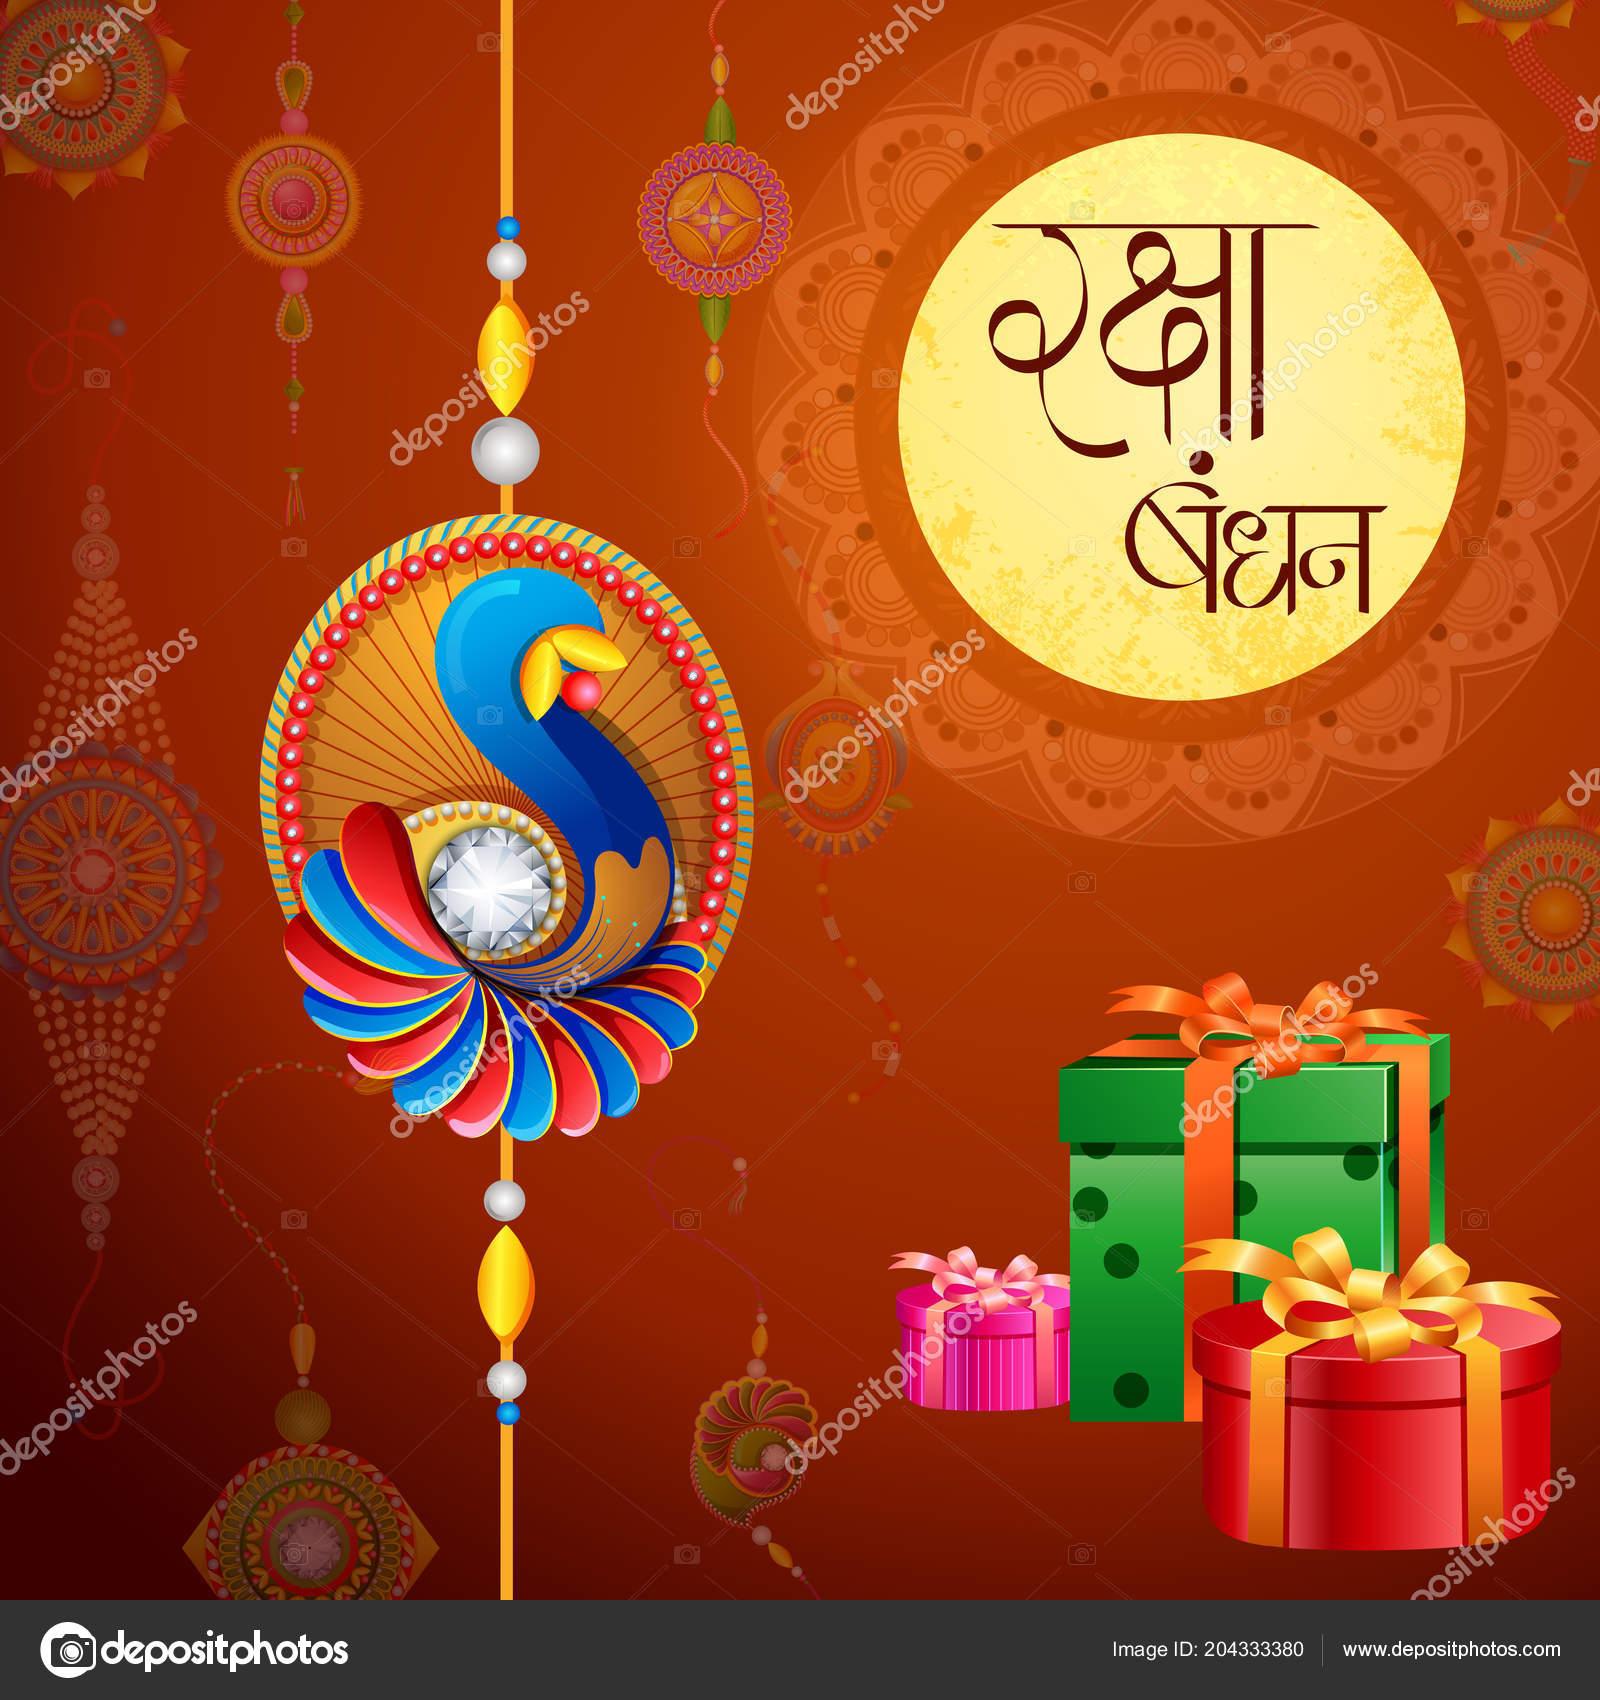 Decorated Rakhi For Indian Festival With Message In Hindi Raksha